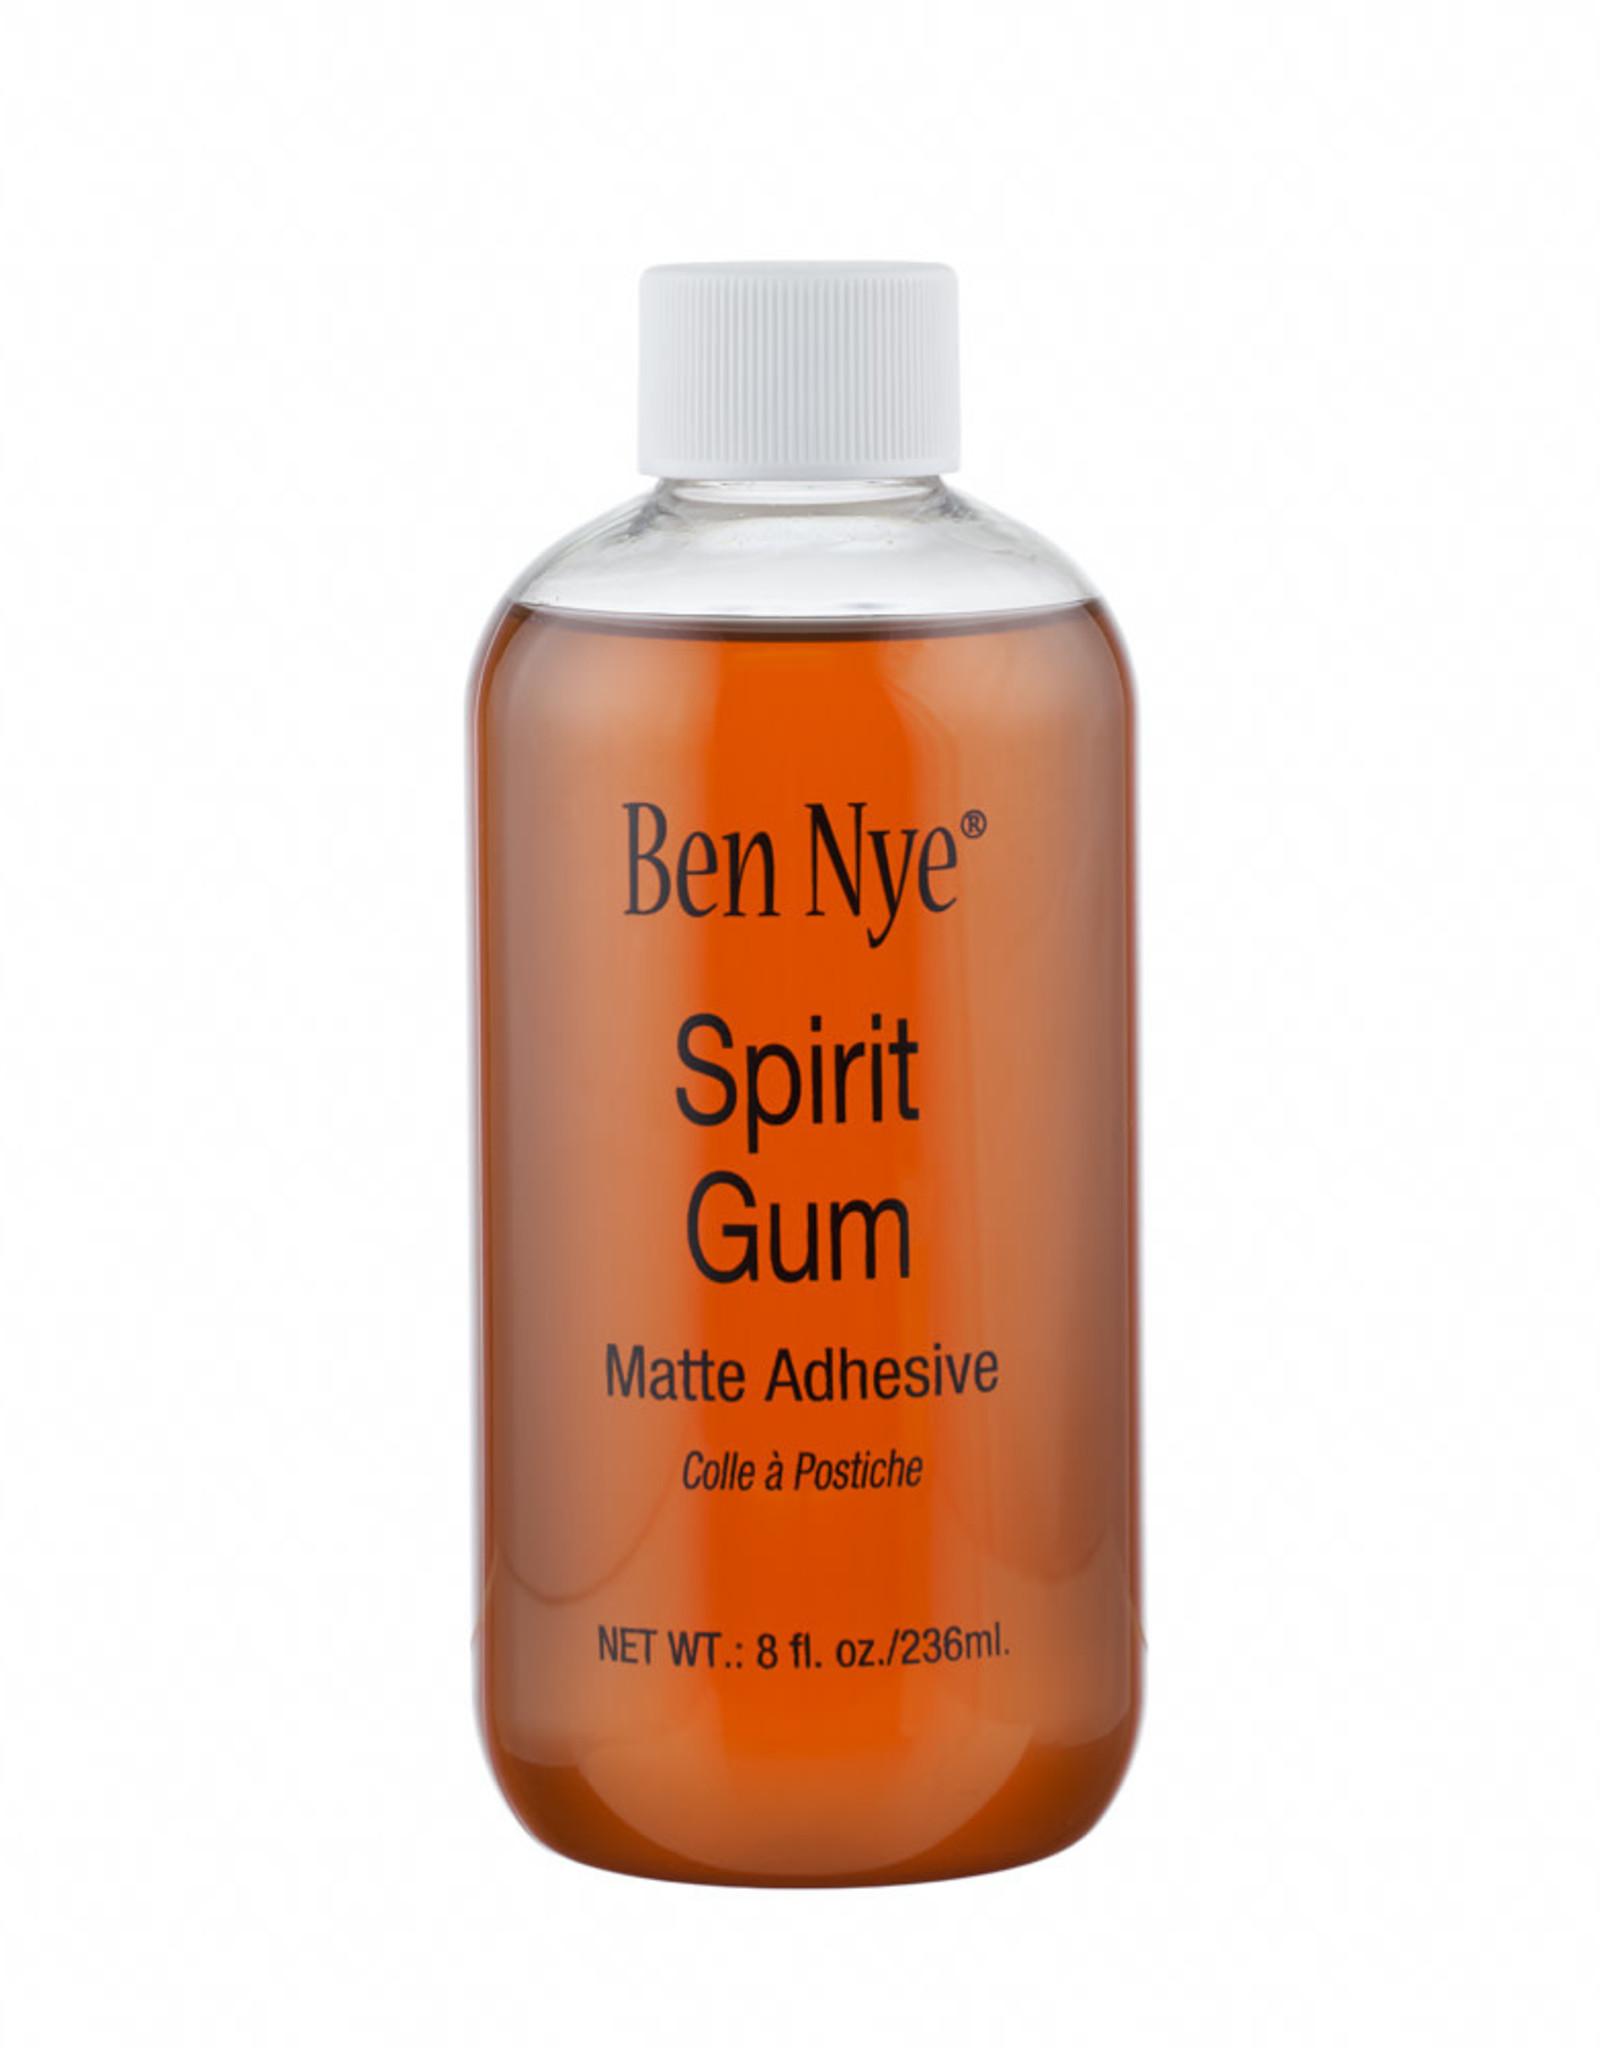 Ben Nye FX SPIRIT GUM ADHESIVE, 8 FL OZ